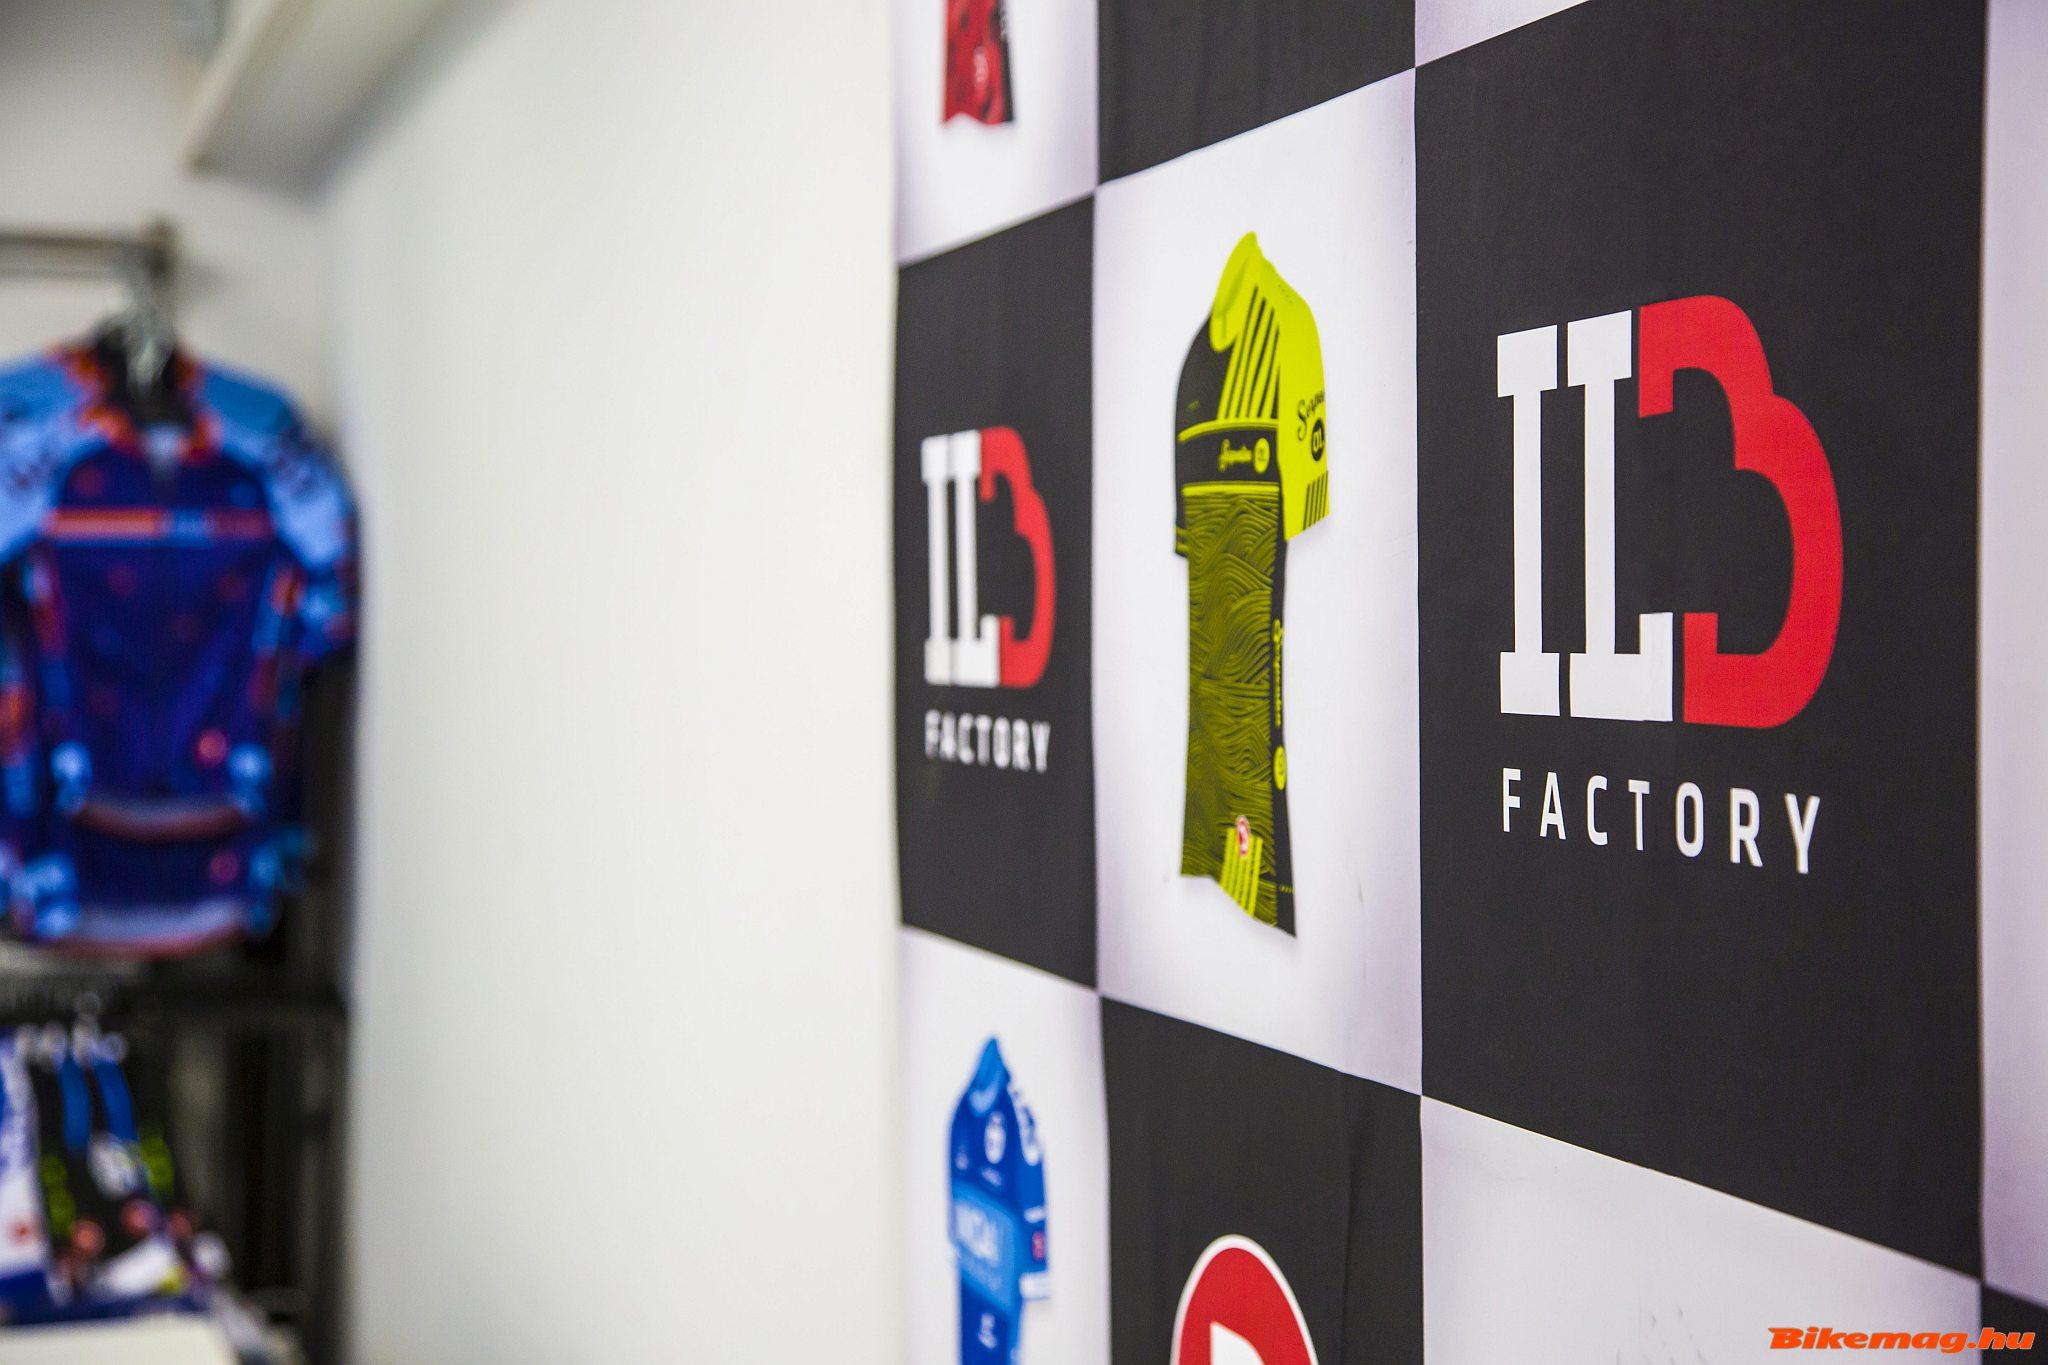 ilb_factory_005